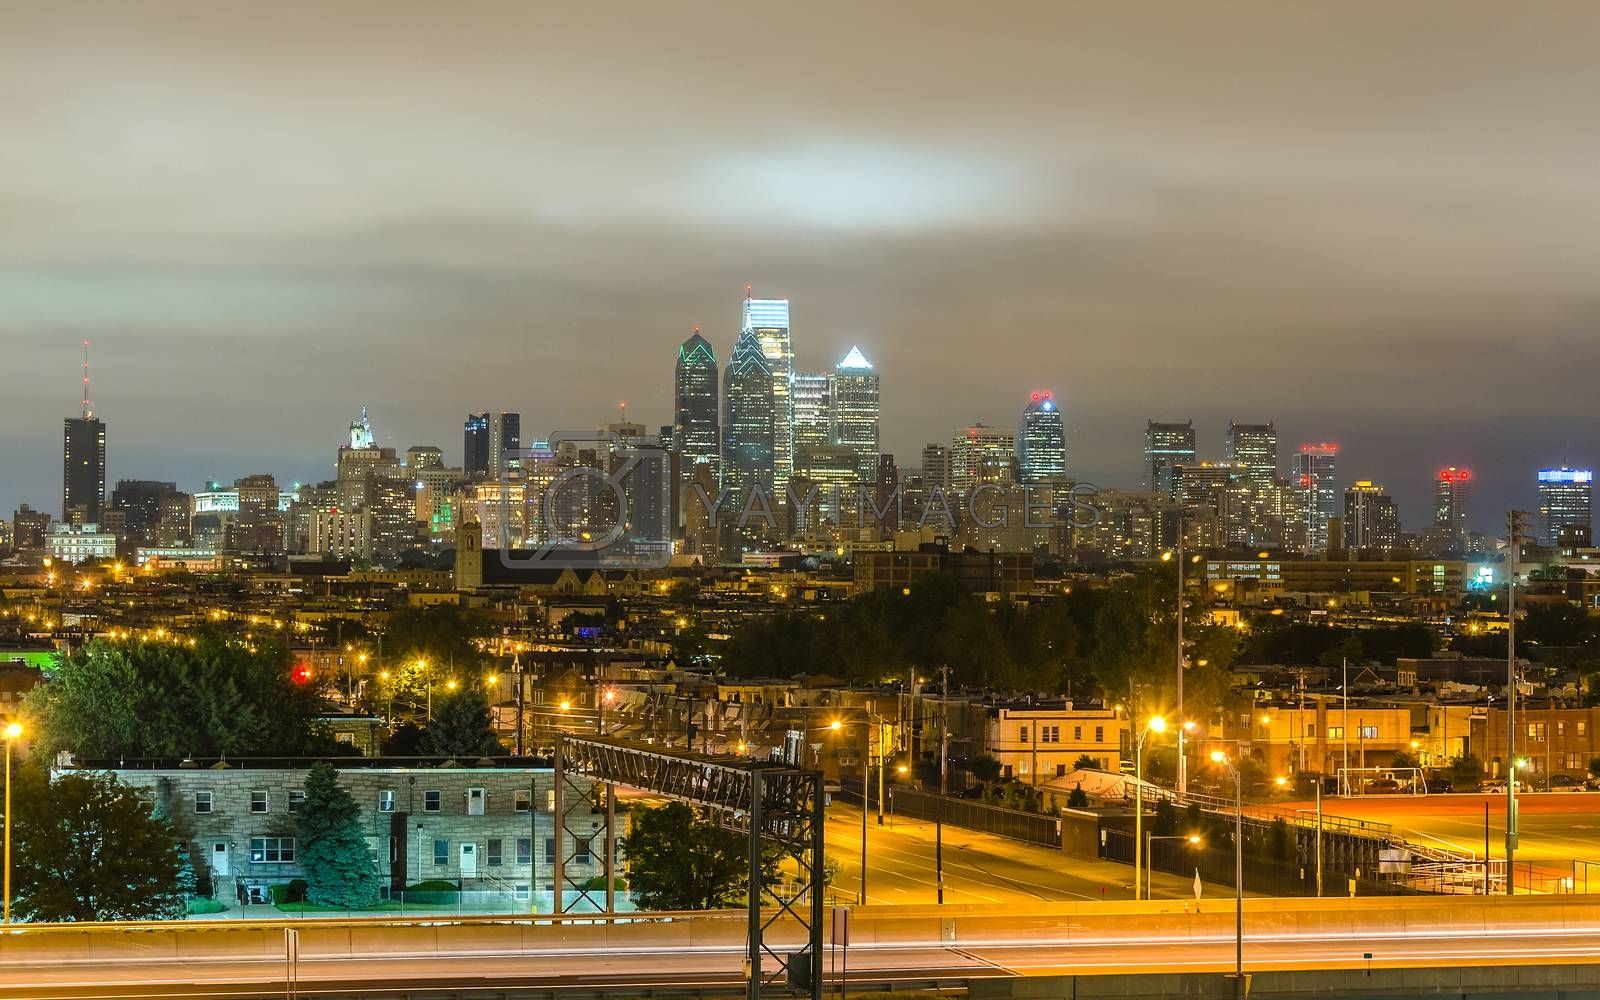 Philadelphia skyline at night as seen from the Stadium District, Pennsylvania, USA